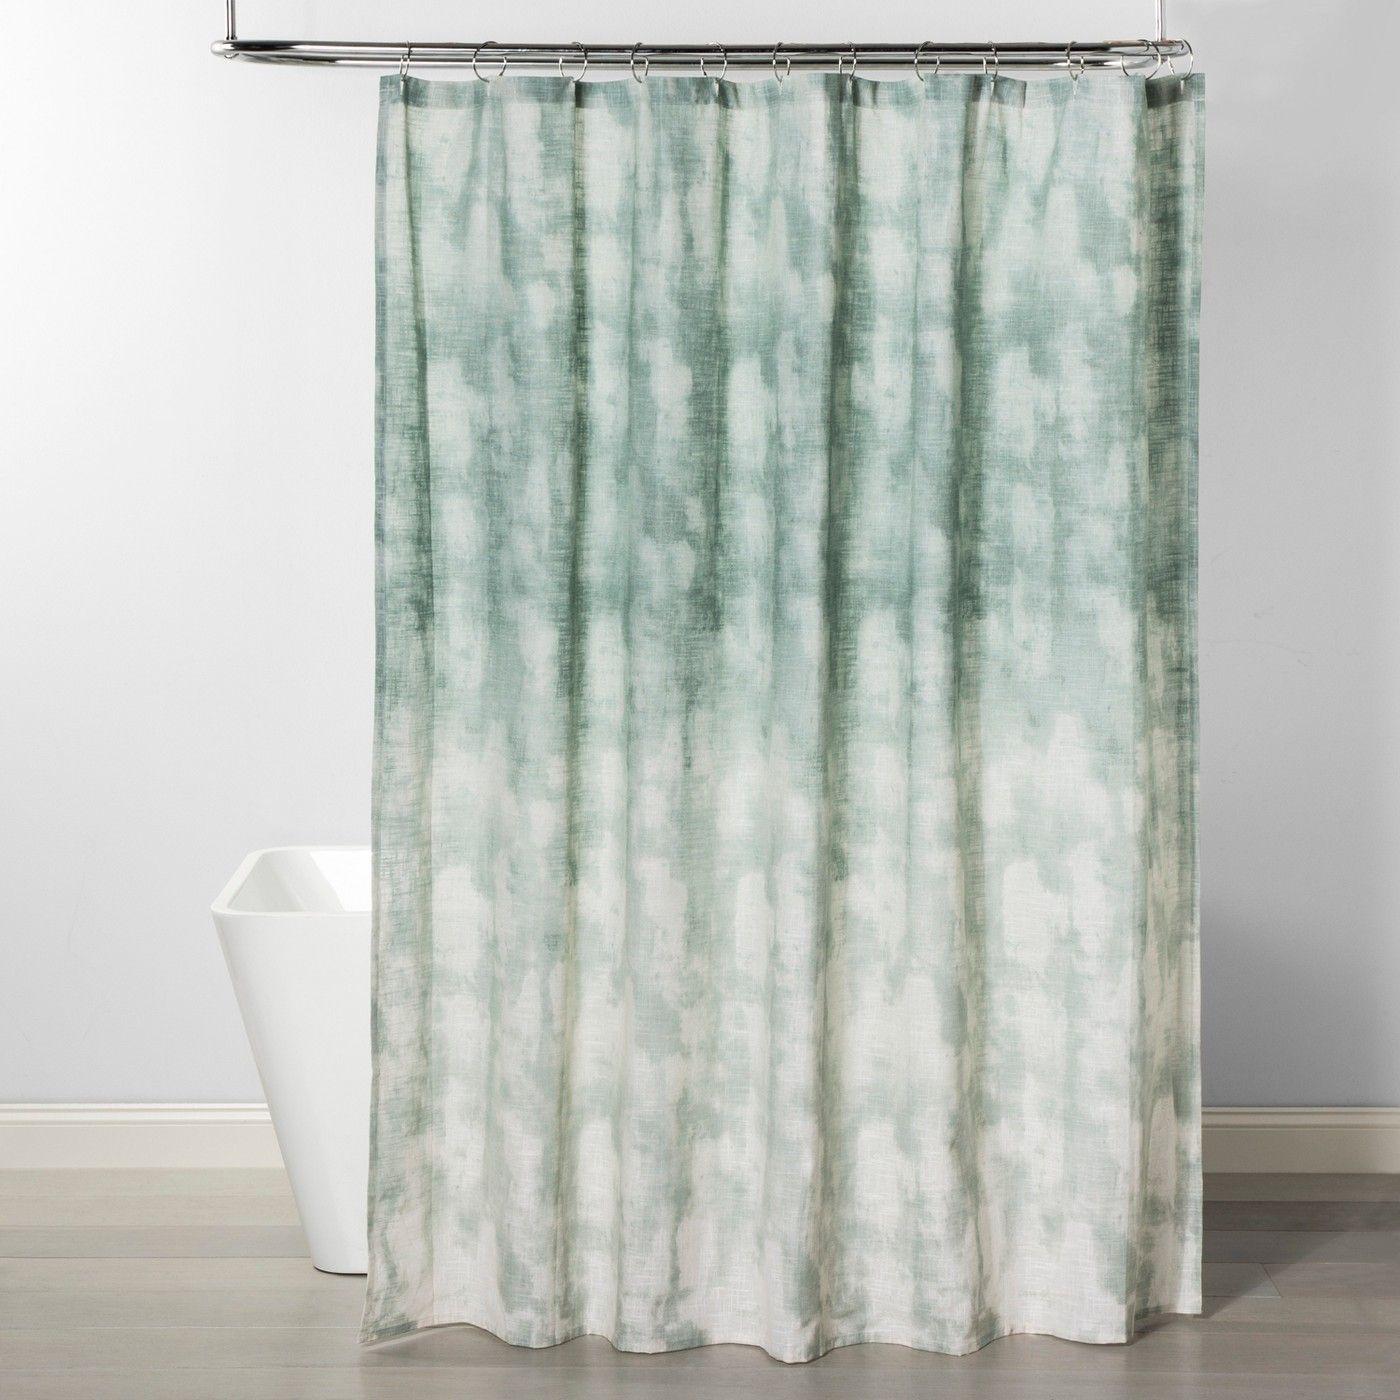 Jacquard Printed Shower Curtain Smoke Green Project 62 Image